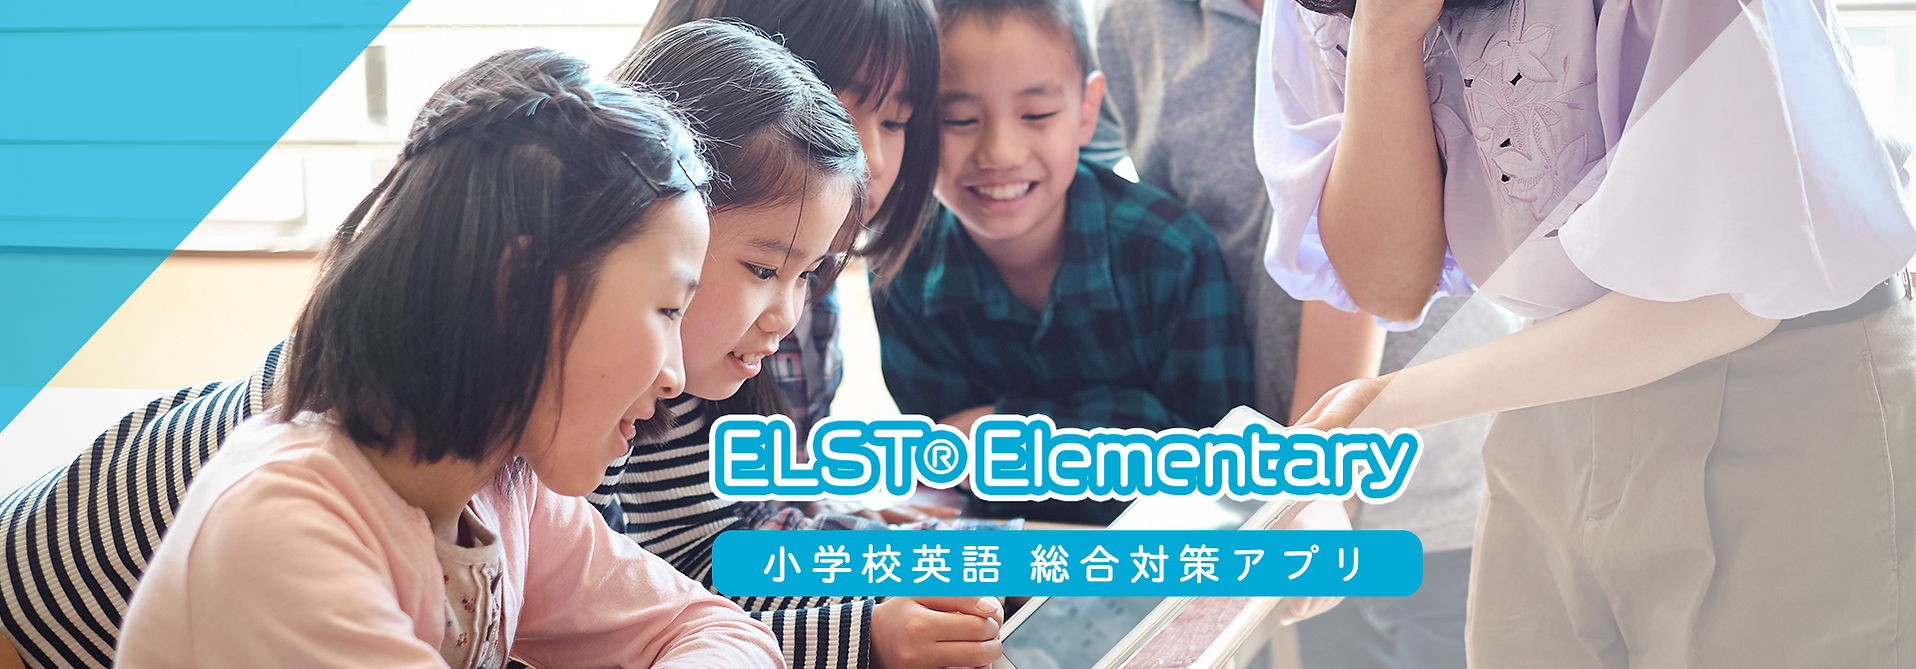 top_slide_elst_elementary.png